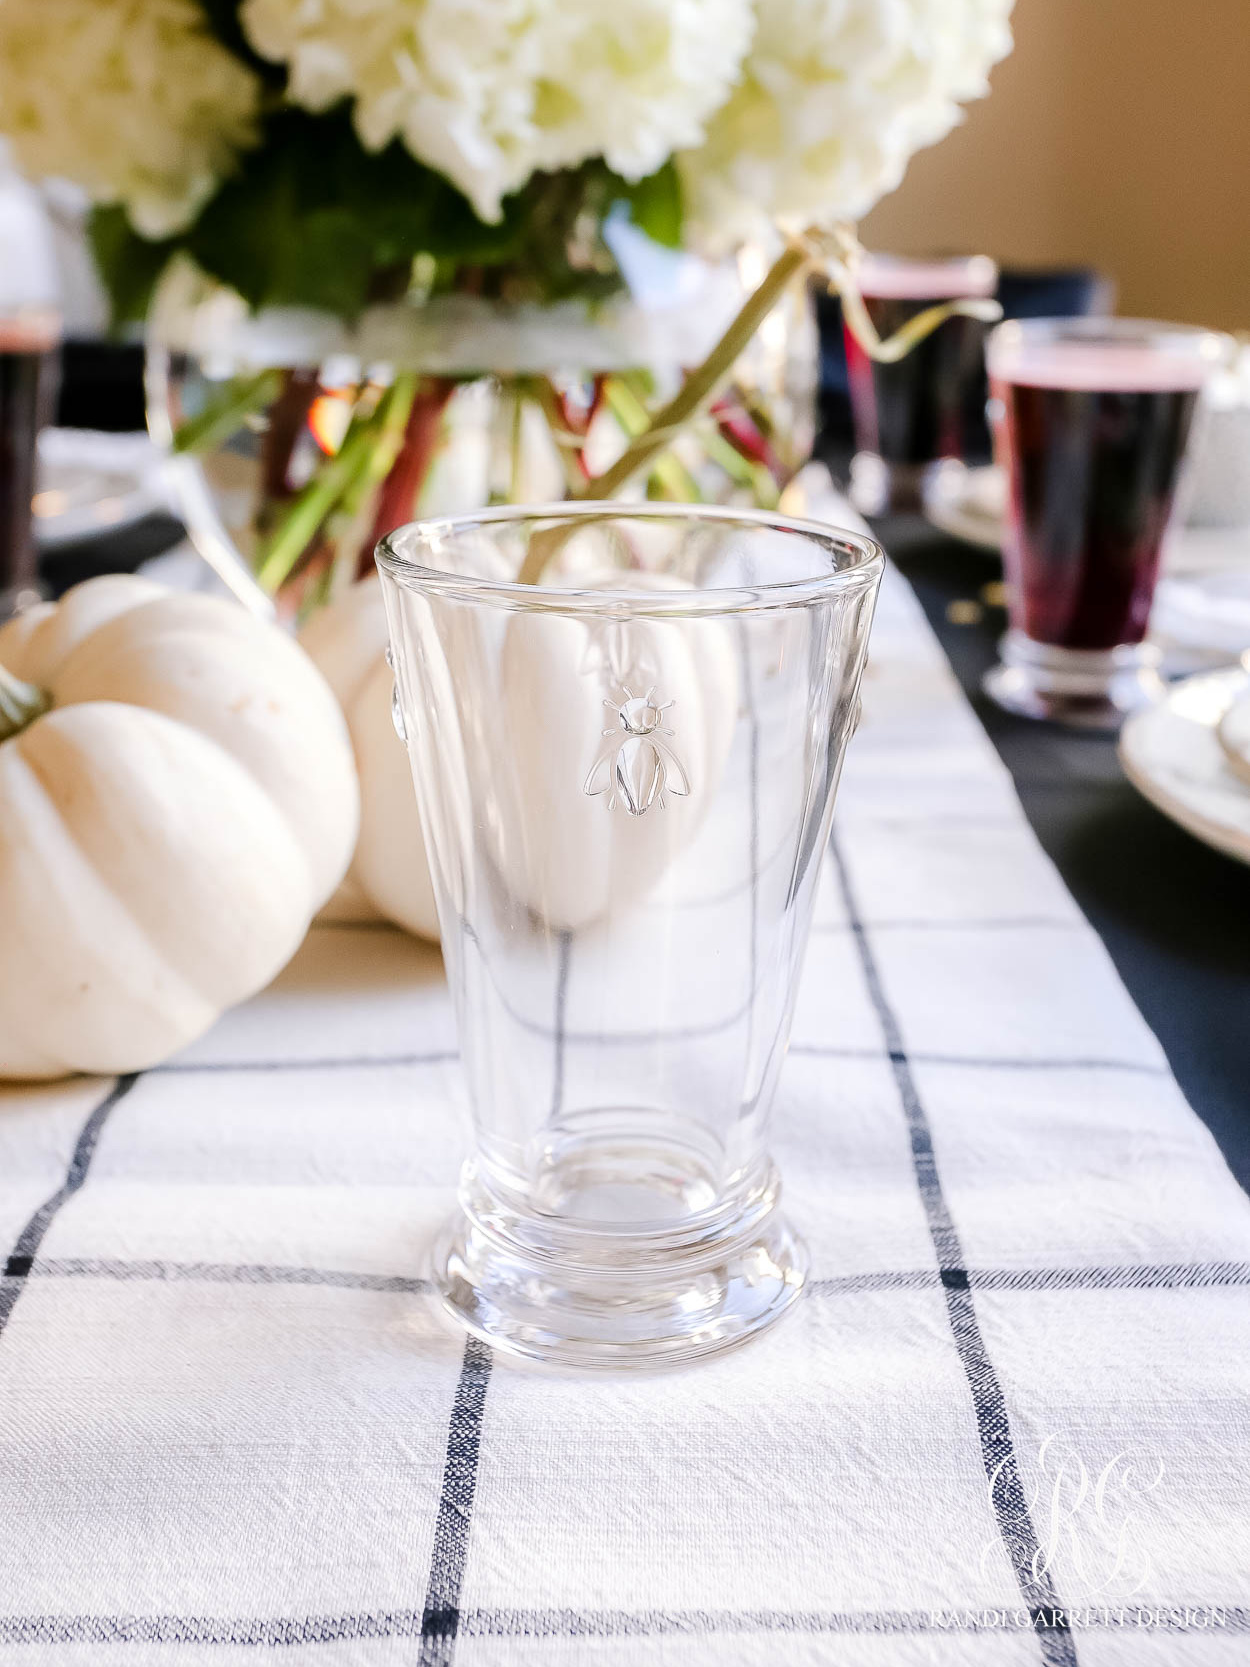 Beware Halloween Table bee glasses